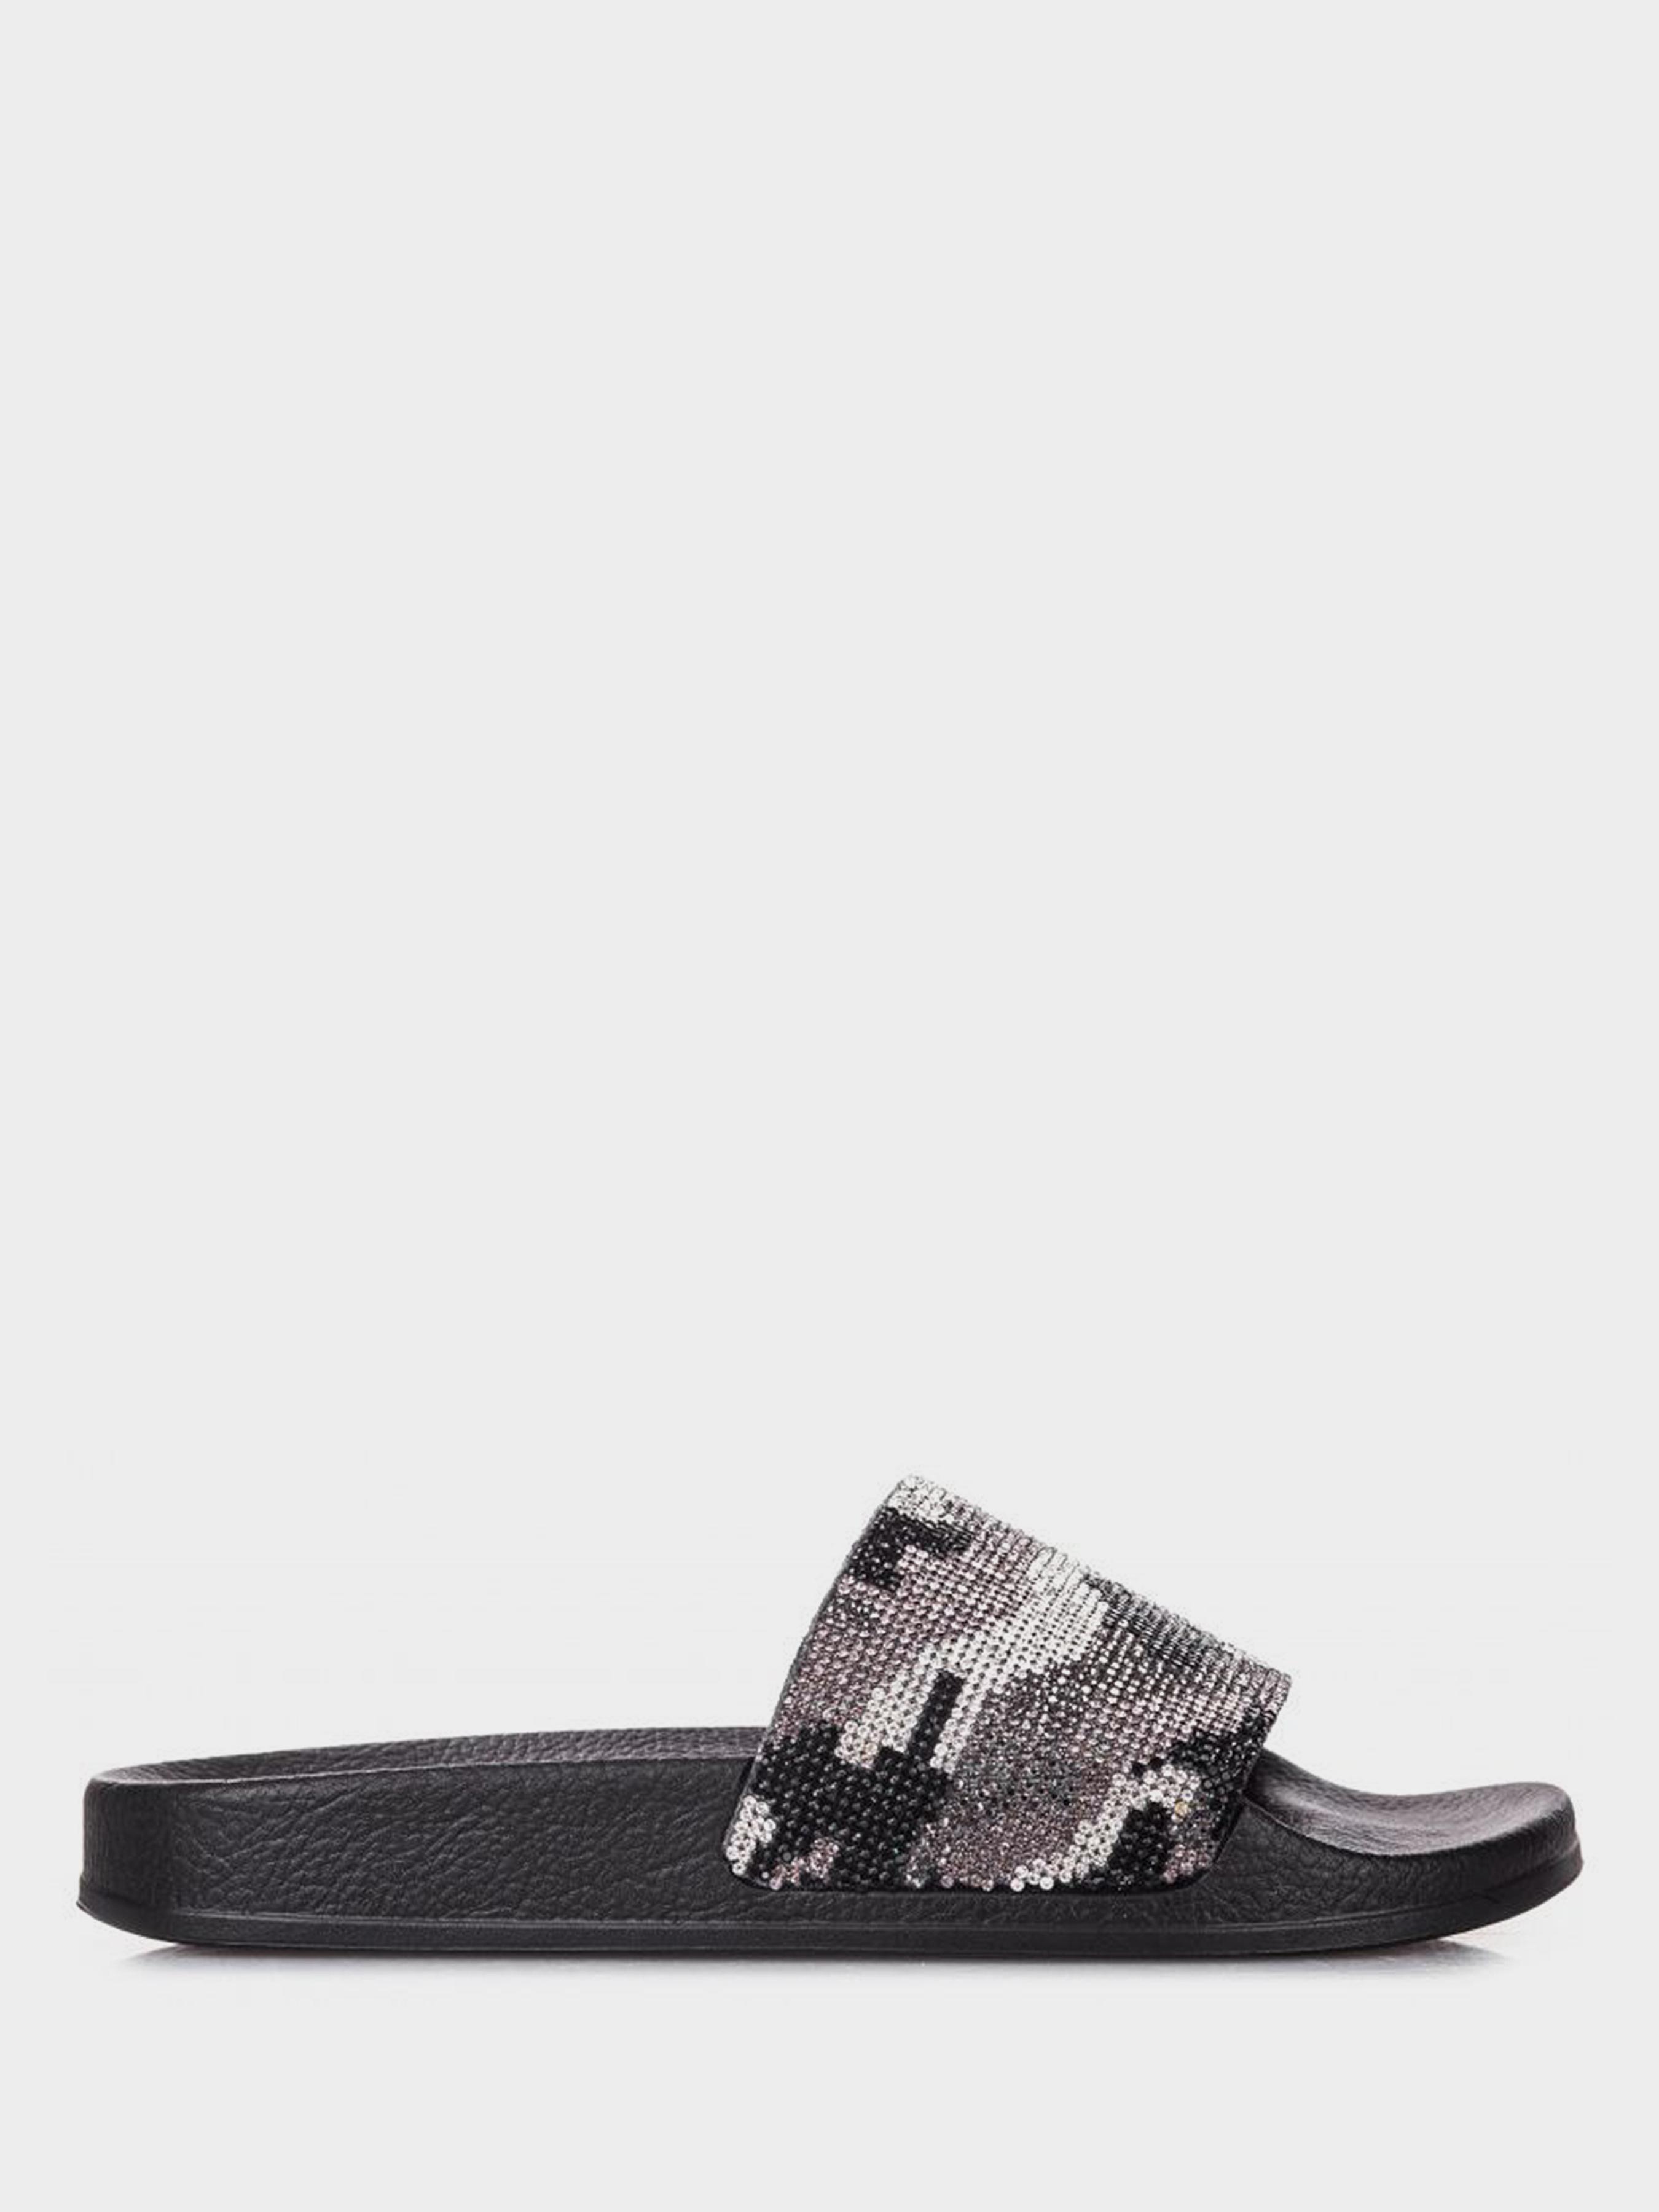 Шлёпанцы для женщин Casta & Dolly 1Z61 модная обувь, 2017